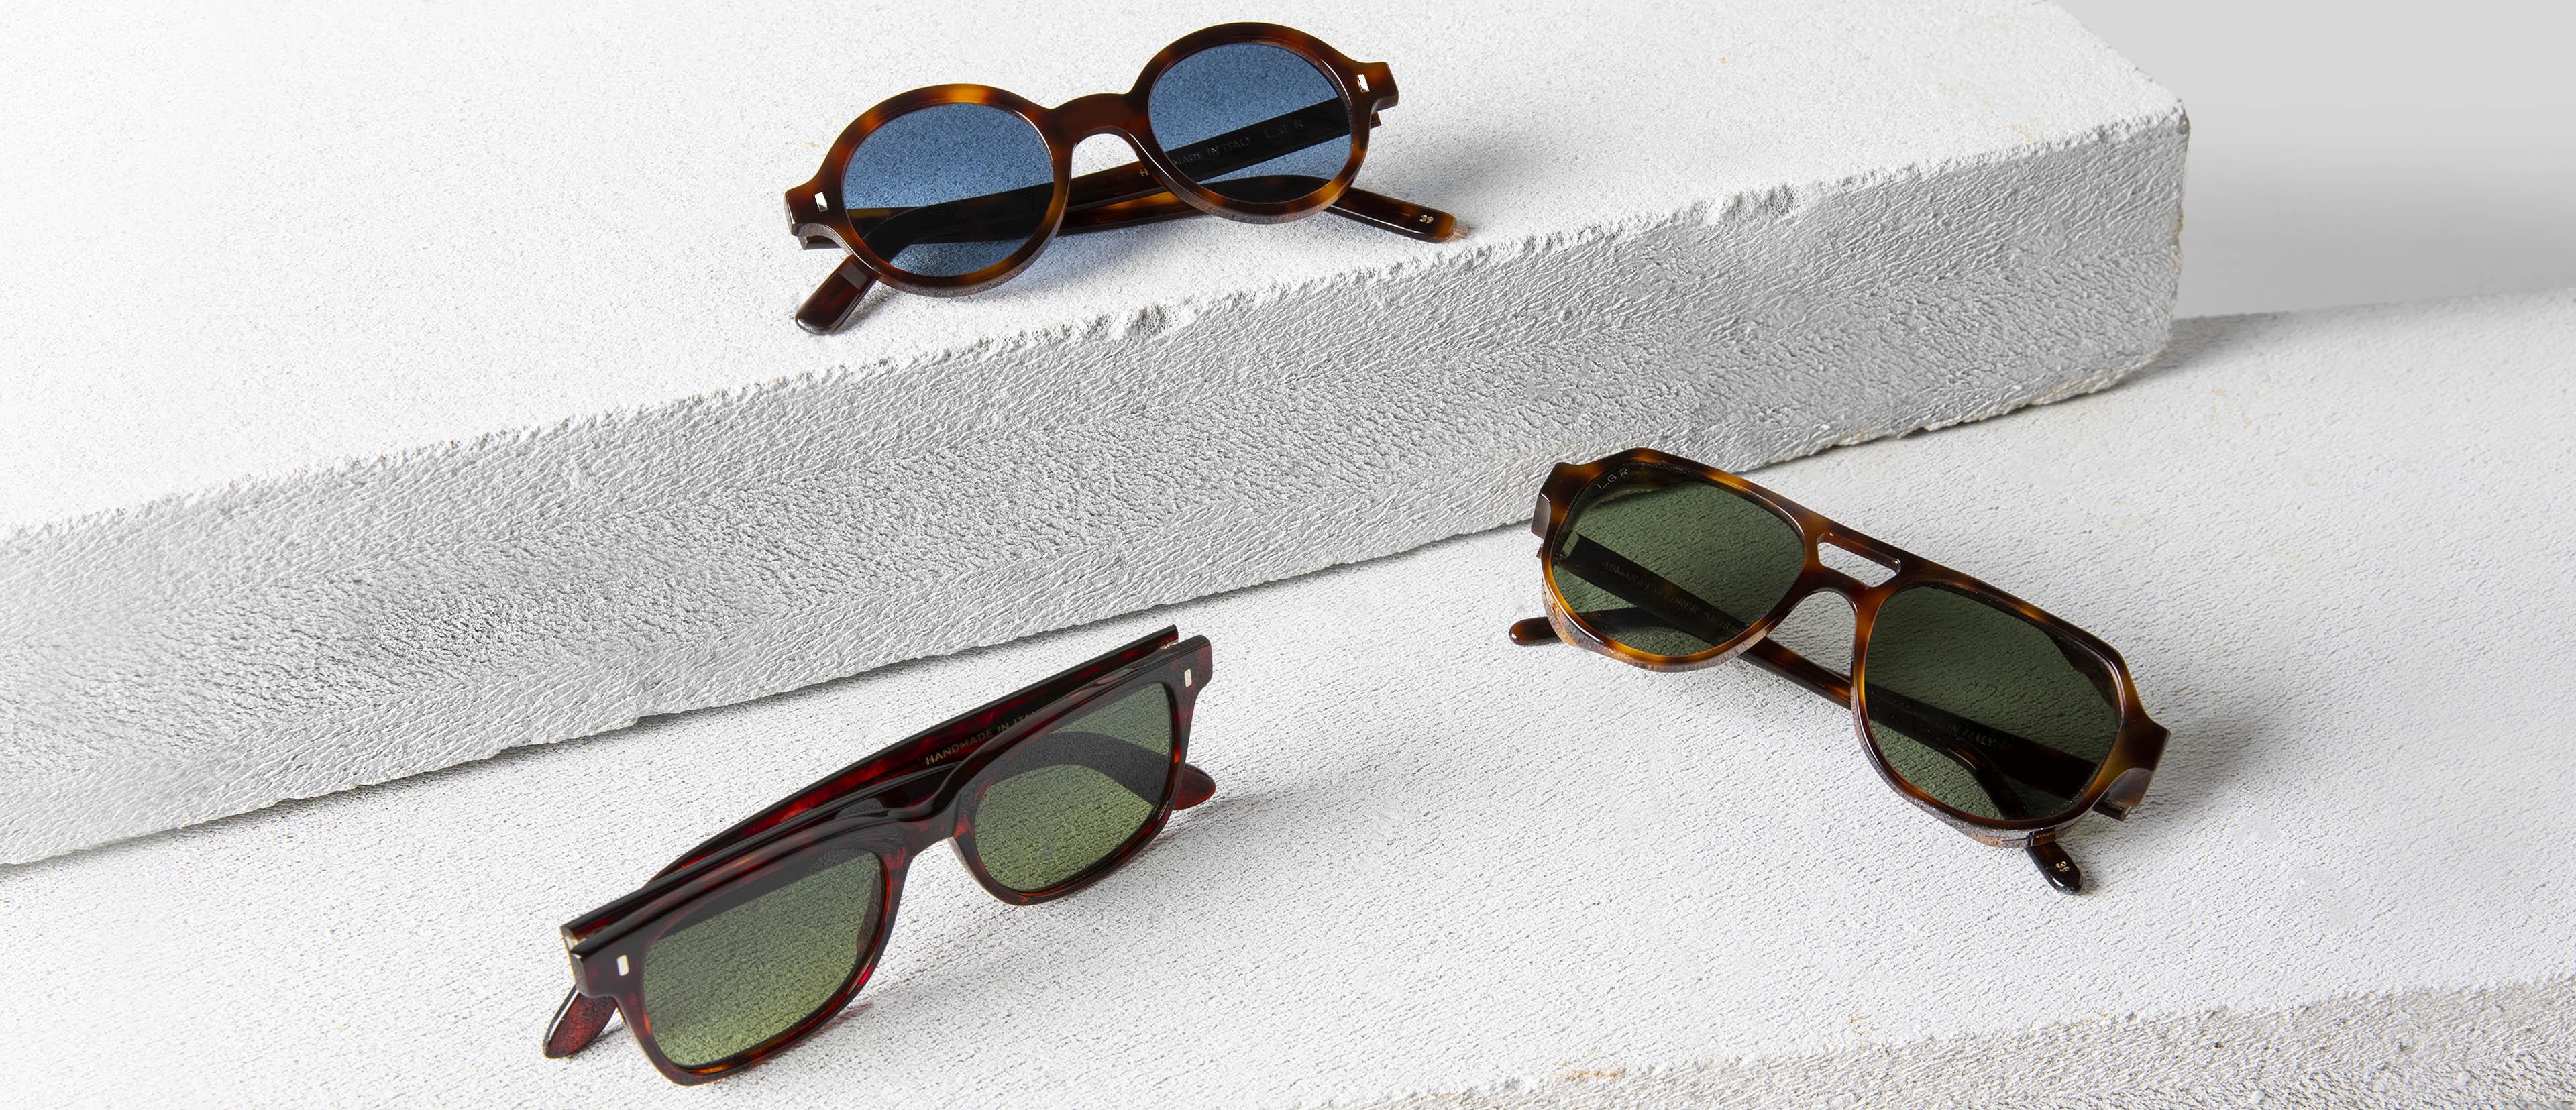 L.G.R. glasses